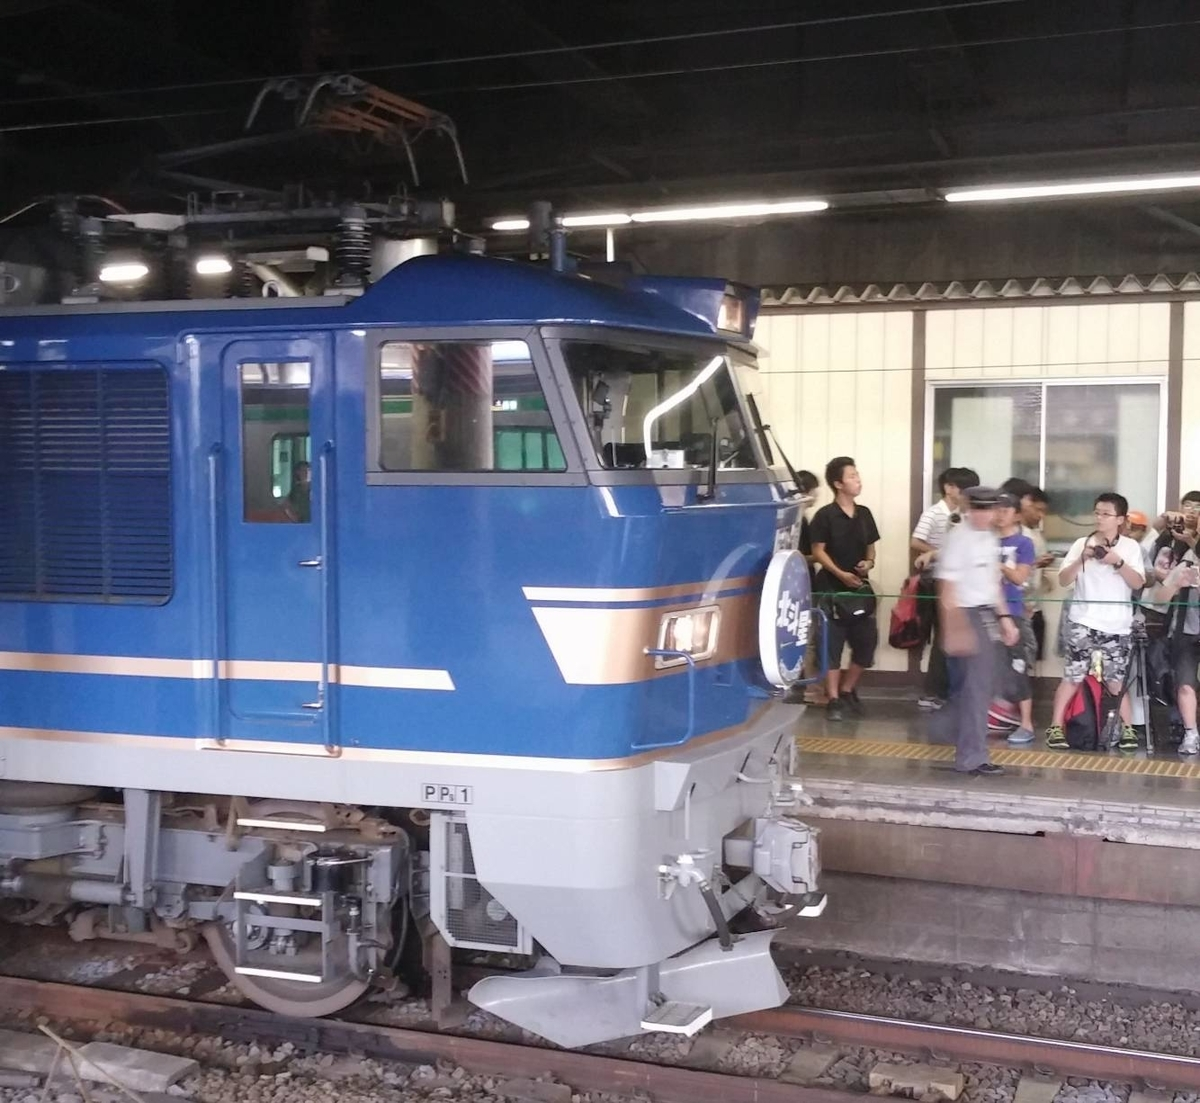 f:id:kishuji-kaisoku:20200307002728j:plain